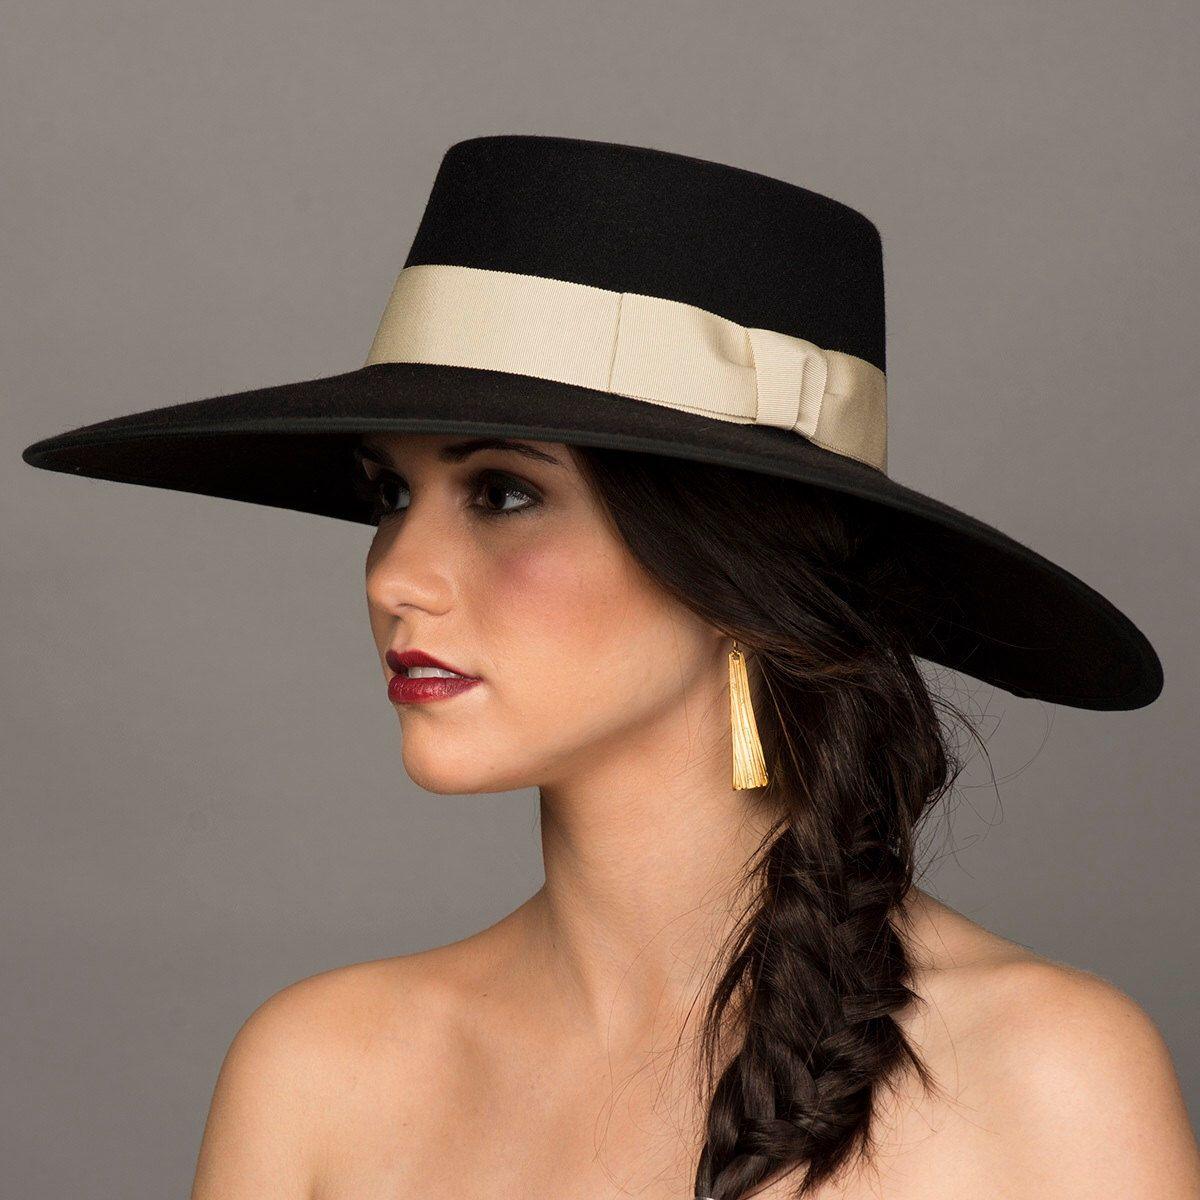 Reserved Gaucho Hat 5 Wide Brim Black Hat Bolero Etsy Women Hats Fashion Fashion Cap Hats For Women